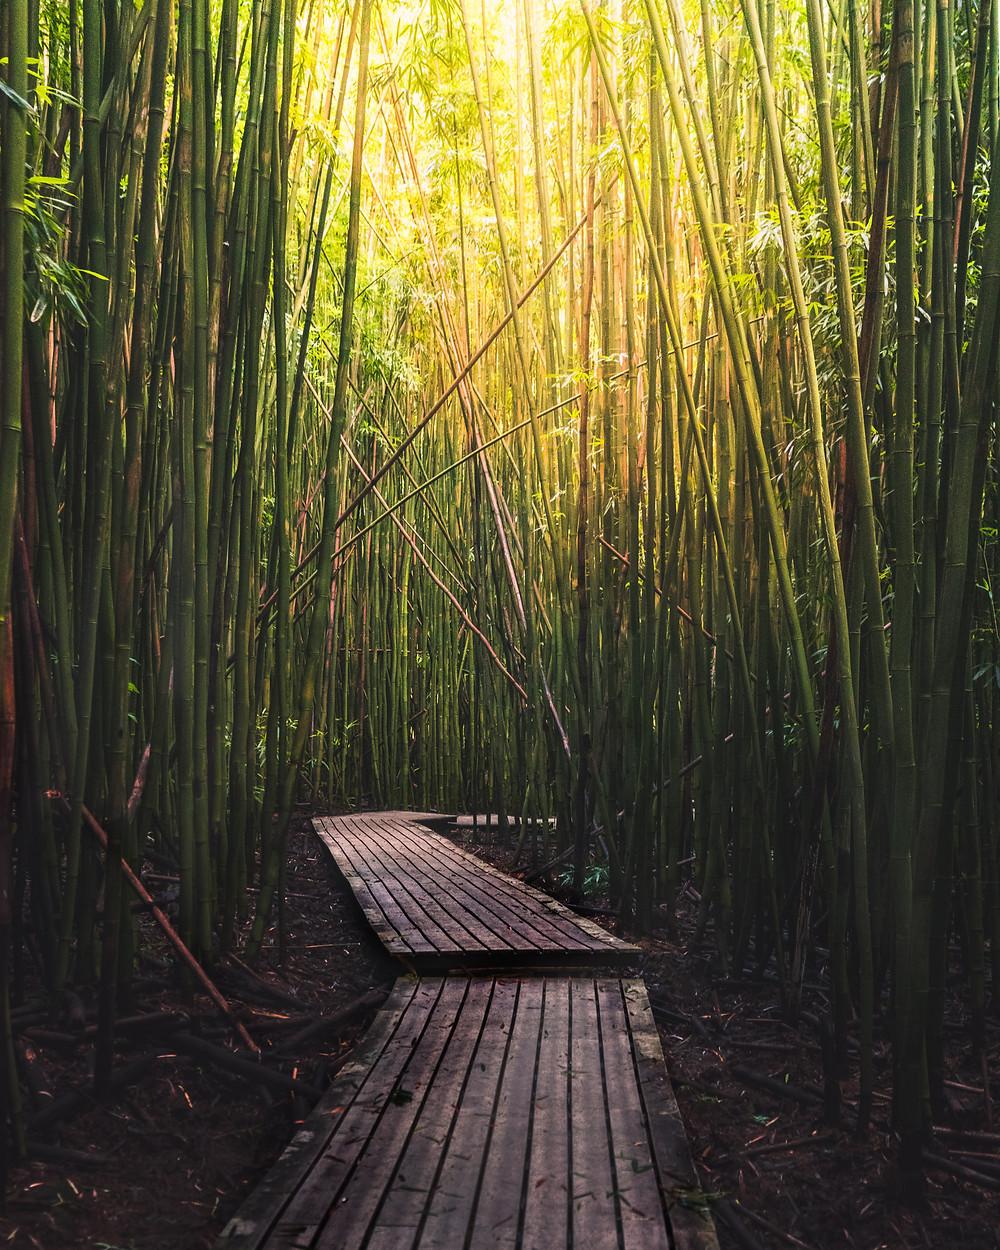 hiking the bamboo jungle in Maui